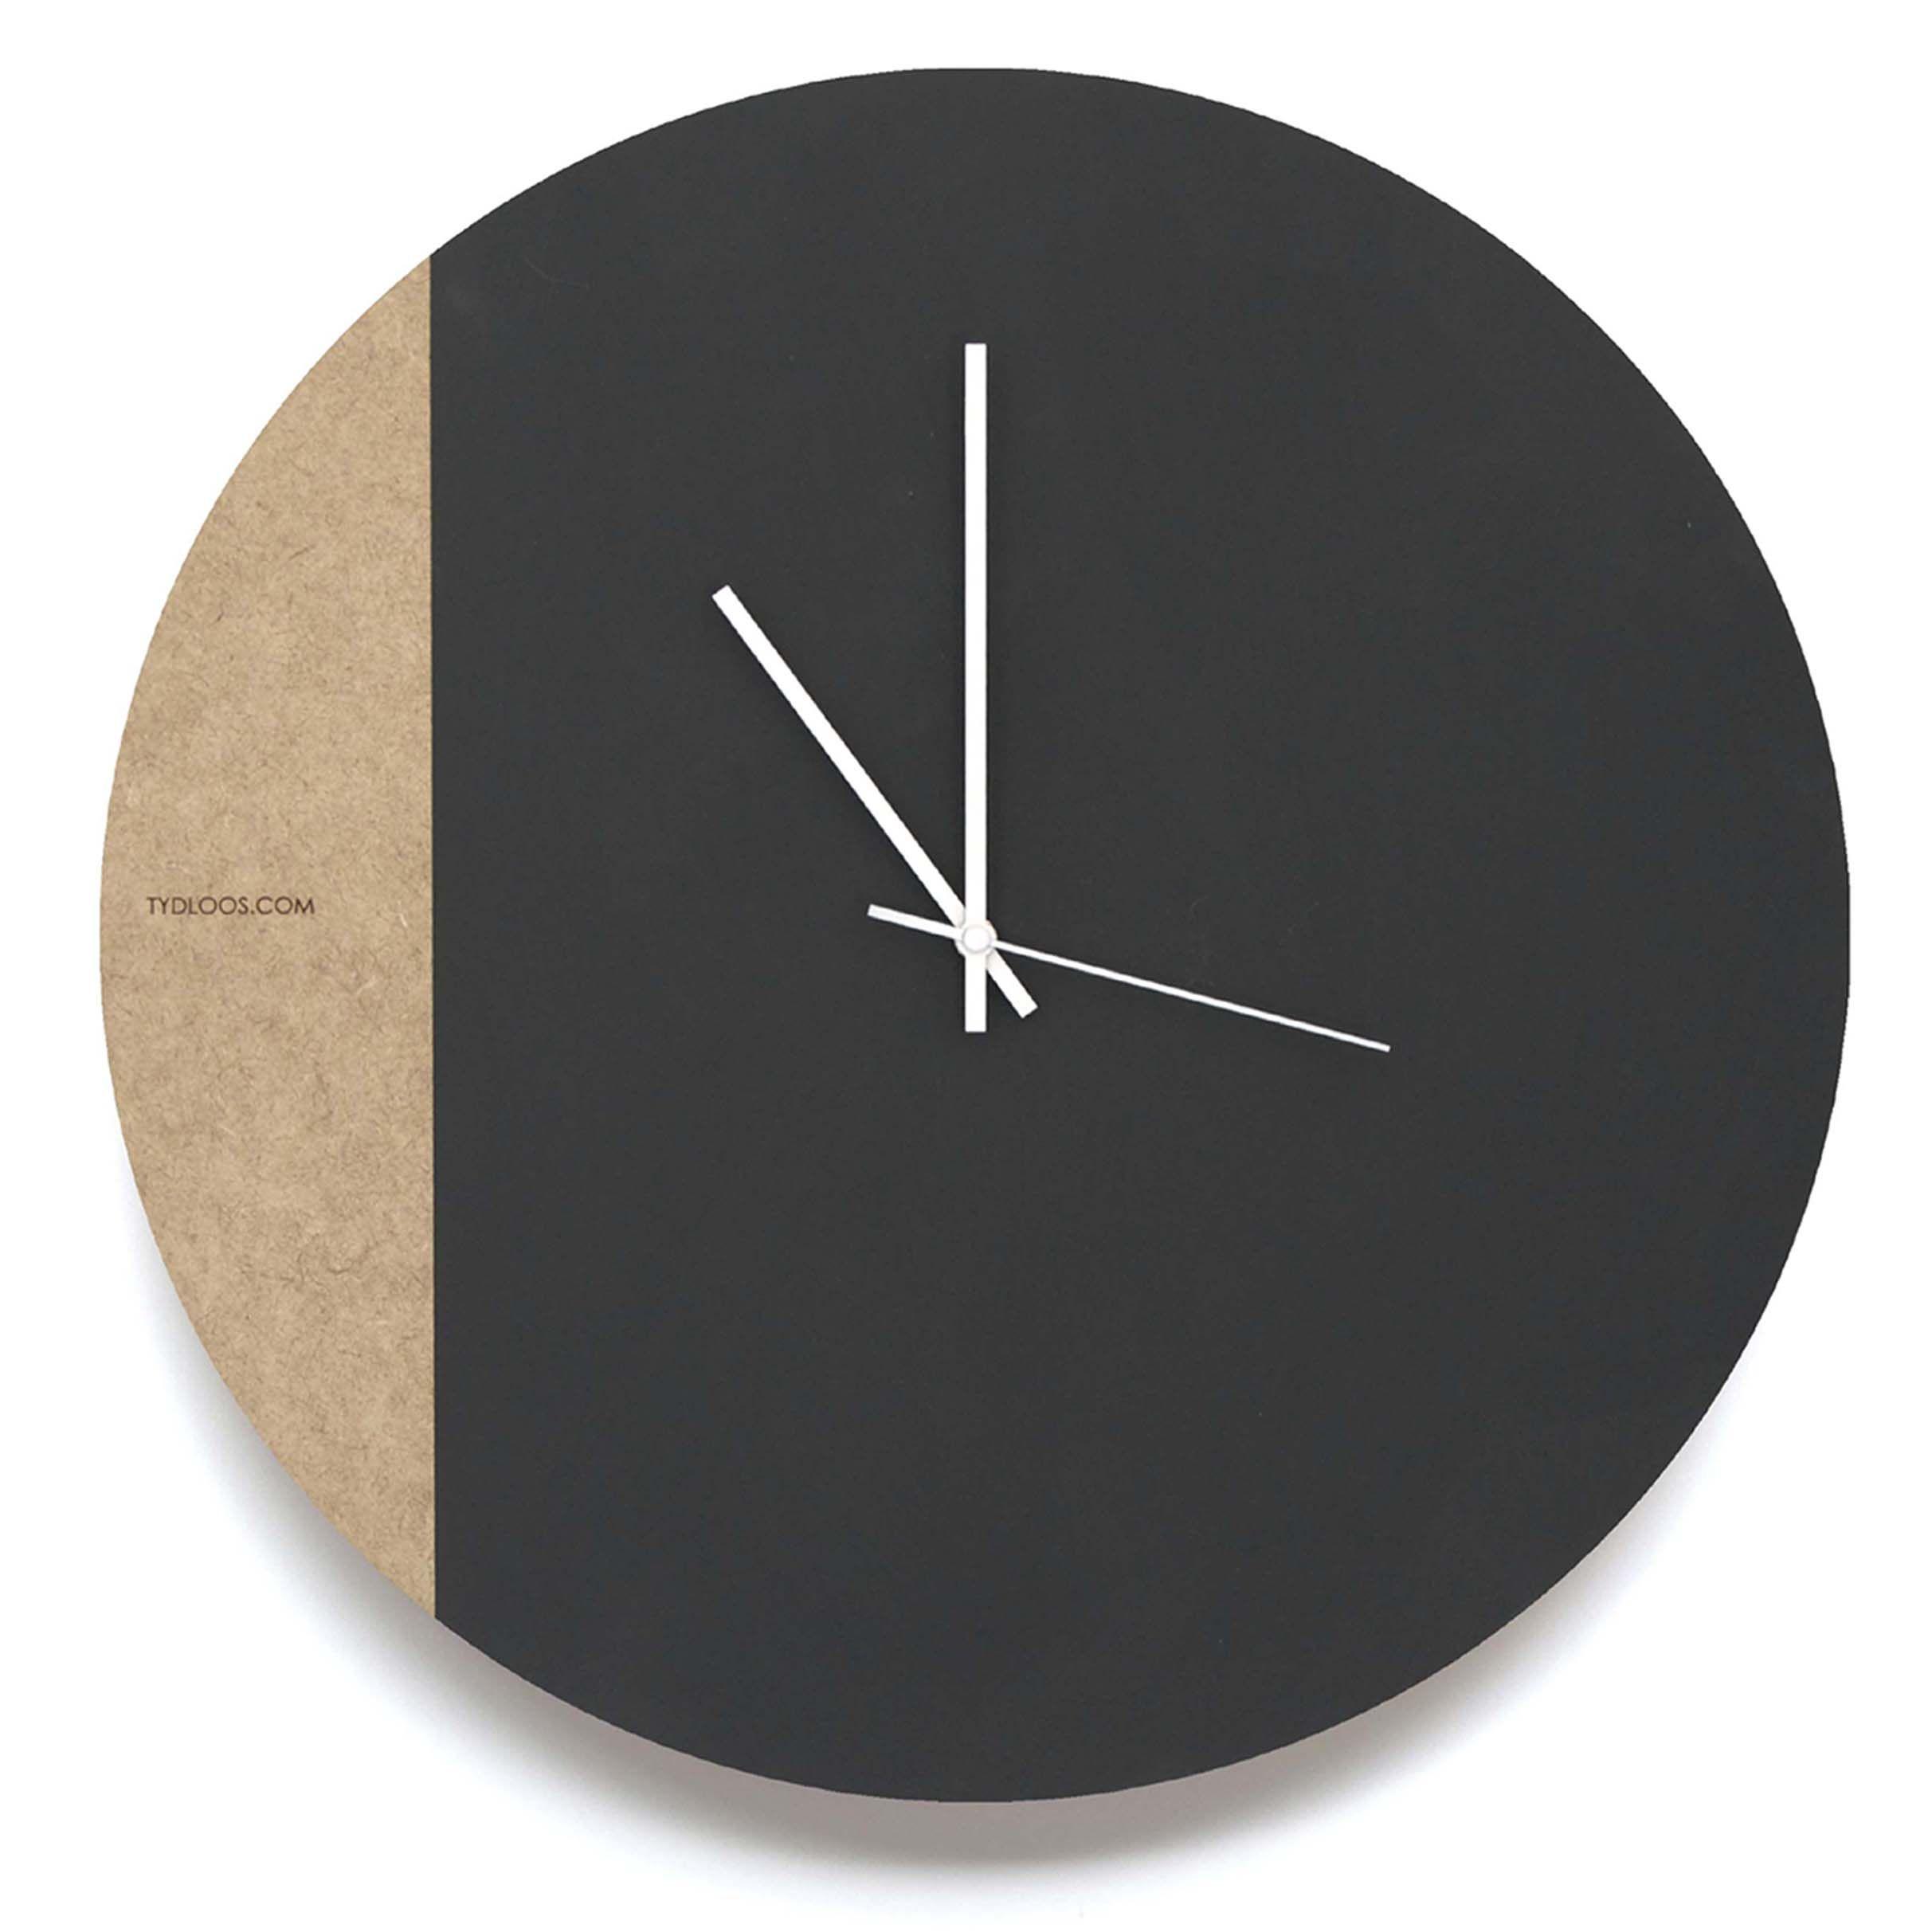 Large minimalist black board wall clock by tydloos at shop large minimalist black board wall clock by tydloos at shopkamersvol amipublicfo Gallery